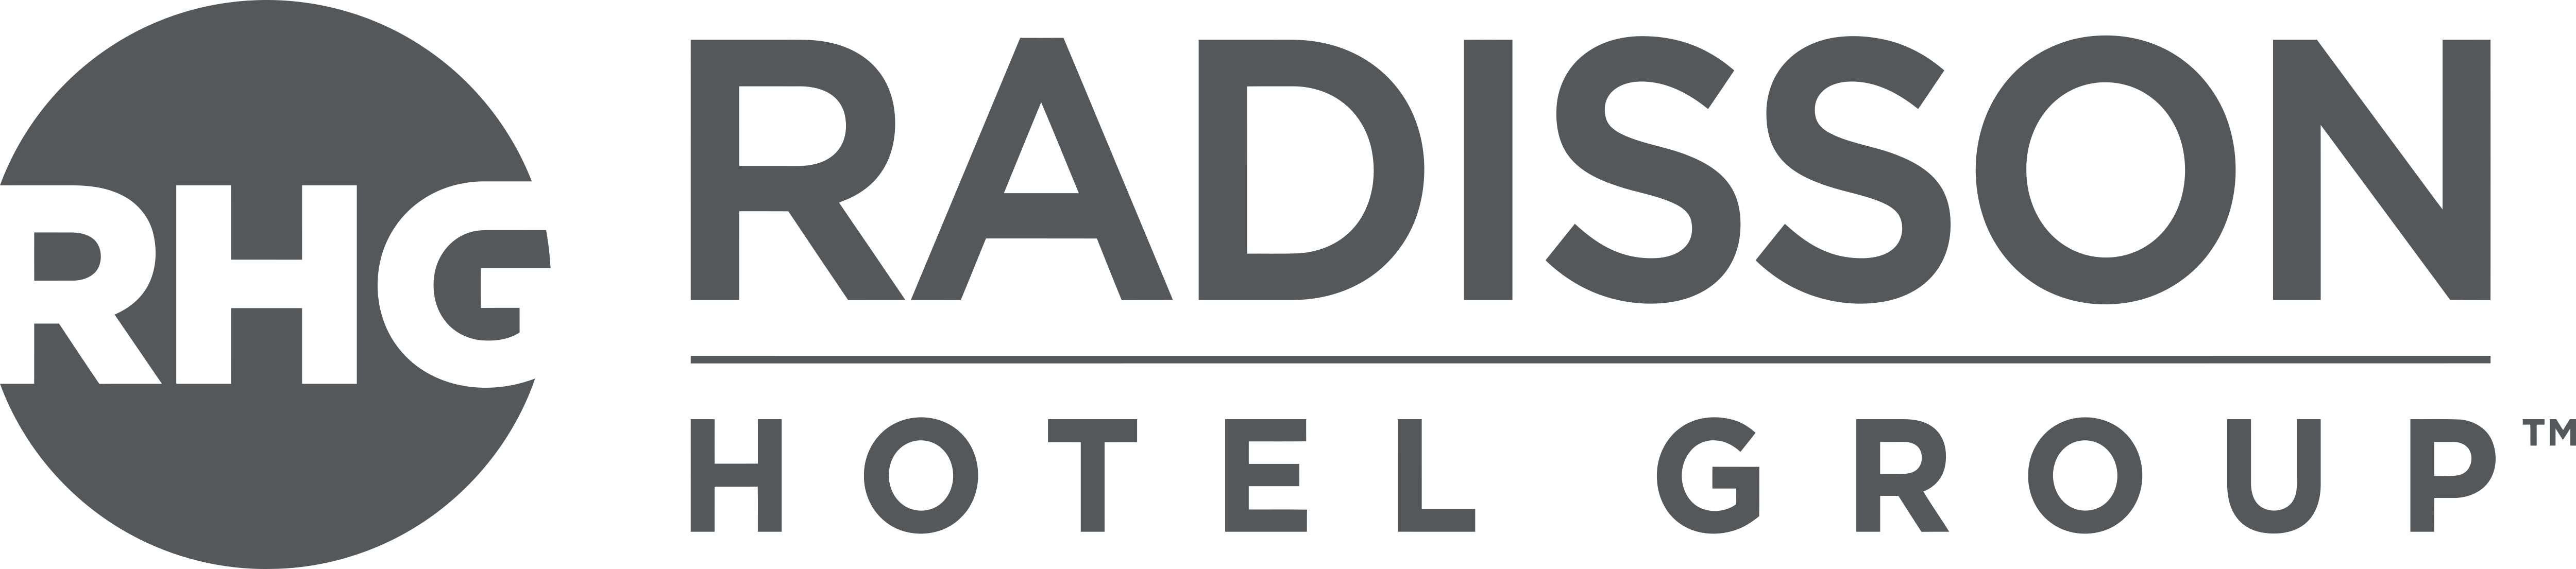 Radisson_Hotel_Group_Logo_horizontally